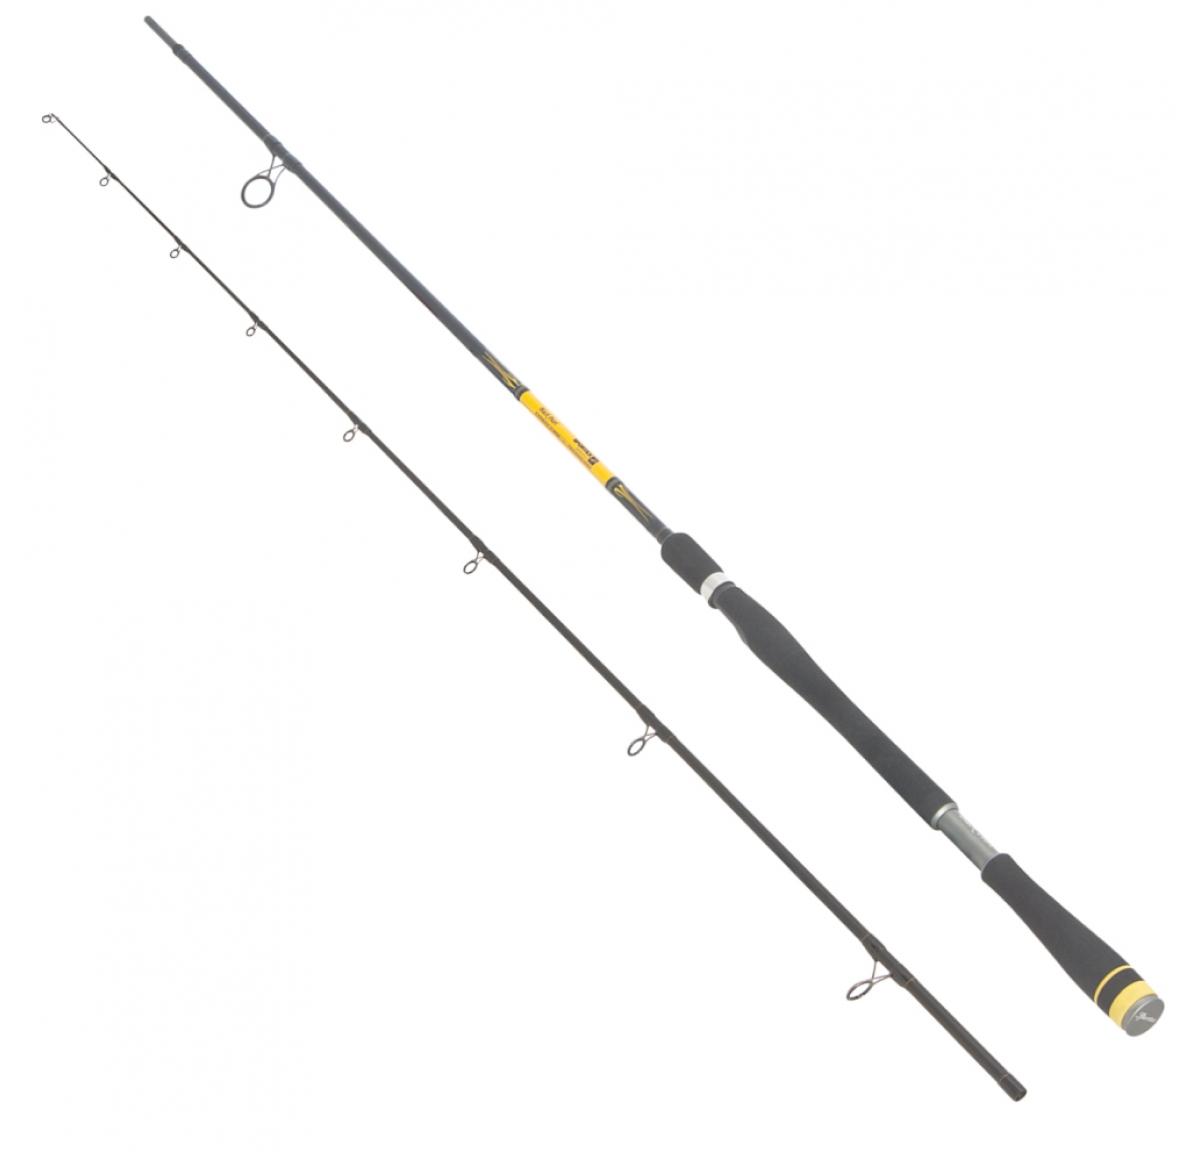 Sportex Black Pearl 180 cm 2-10 g